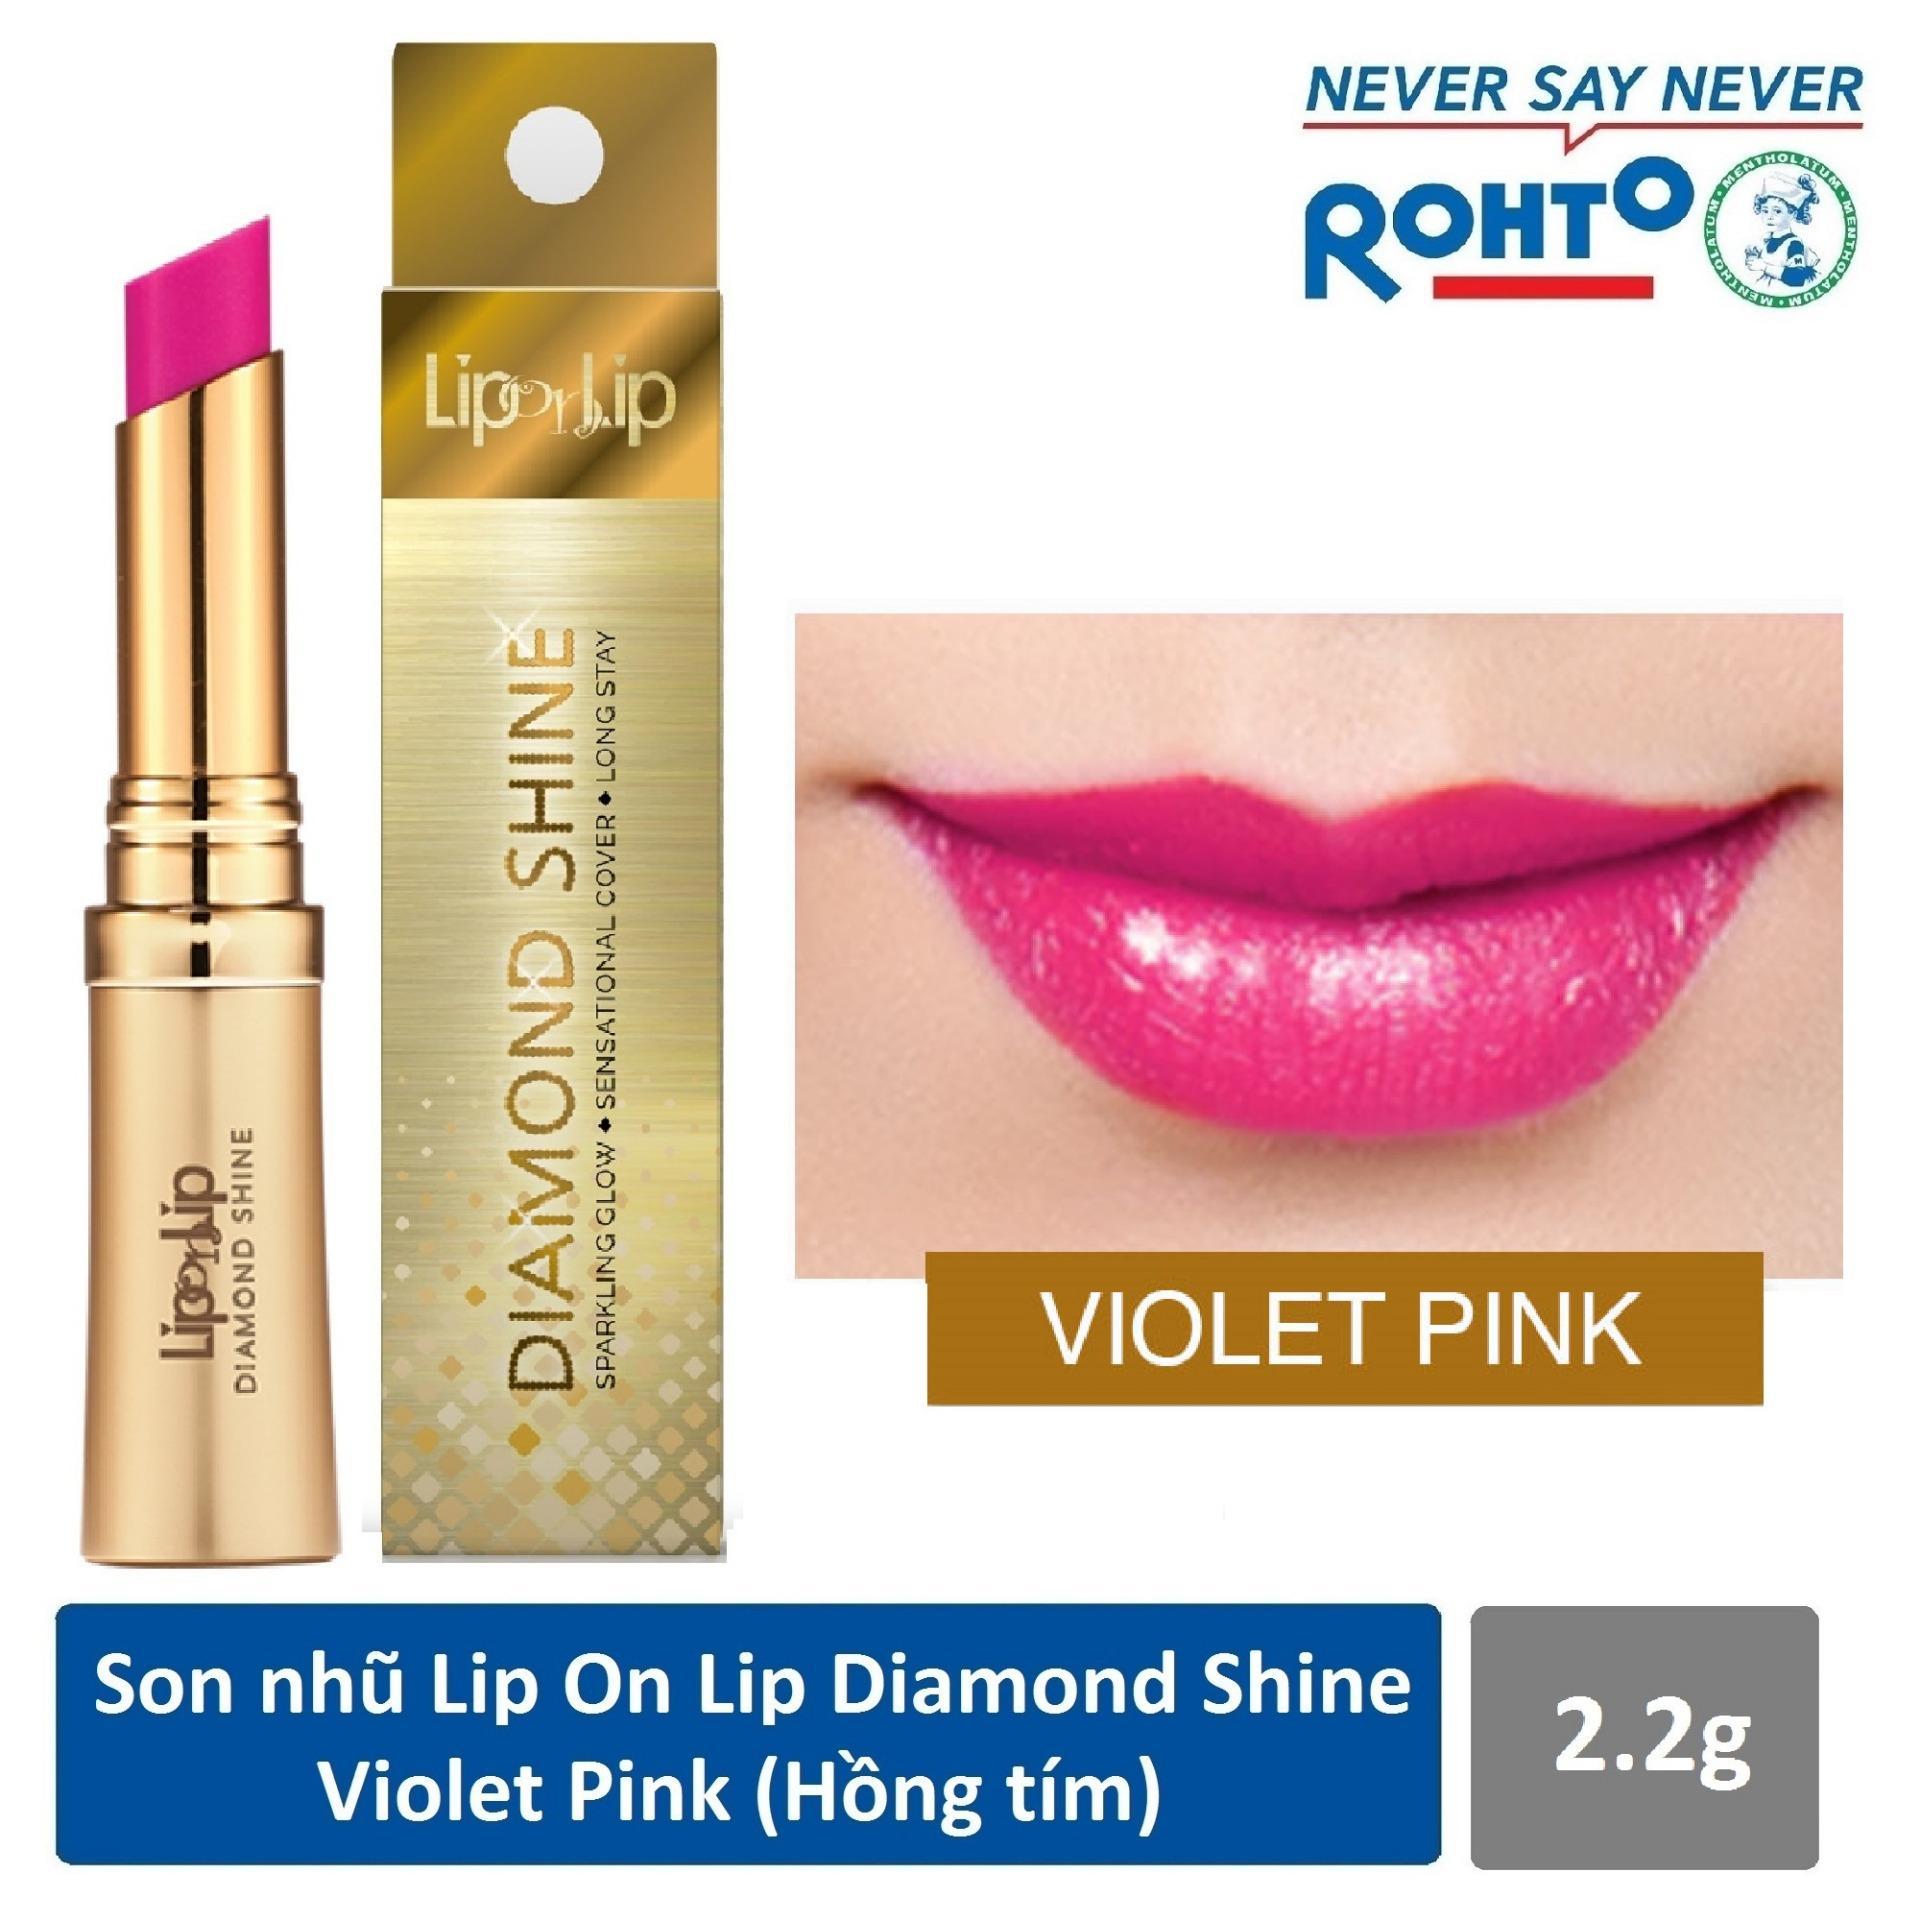 Son nhũ Lip On Lip Diamond Shine Violet Pink 2.2g (Hồng tím) tốt nhất